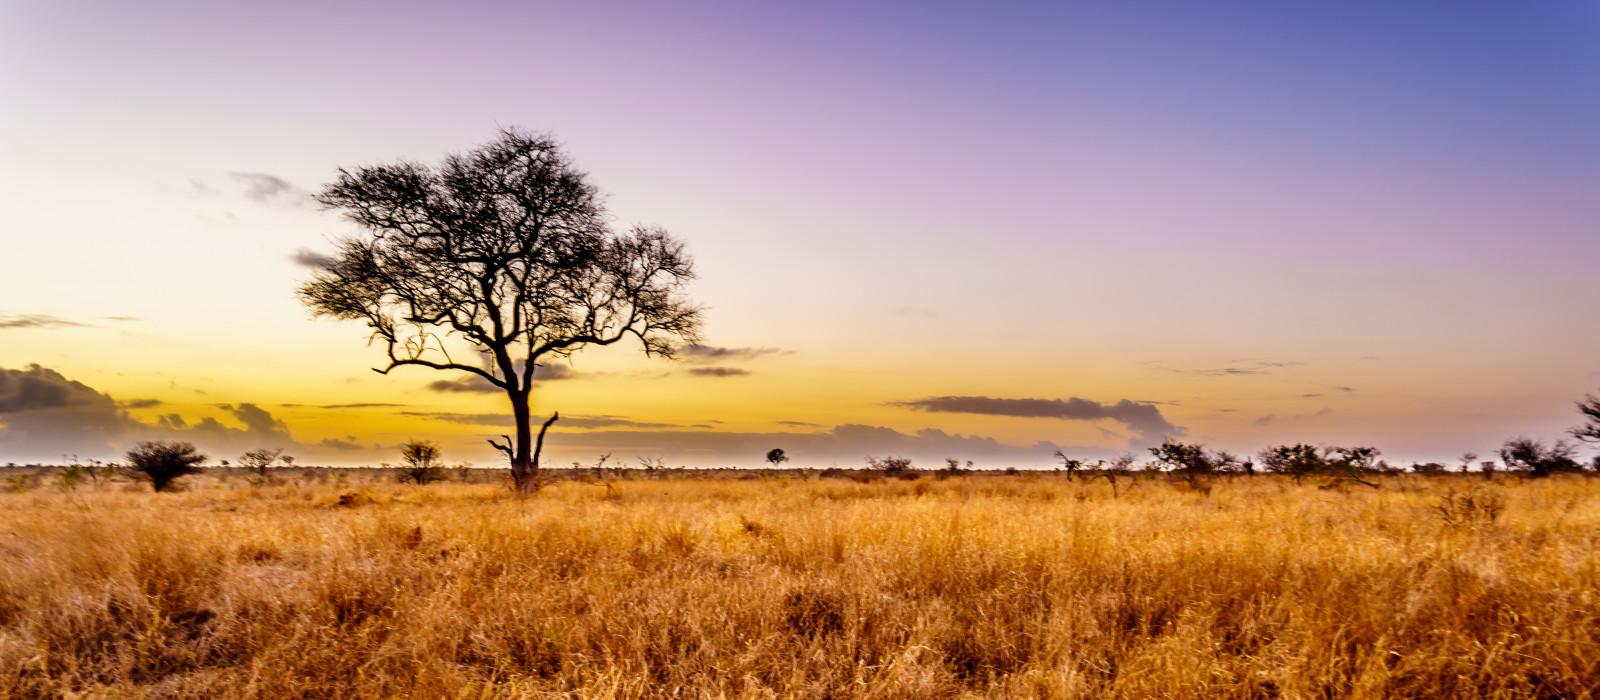 Hotel Chisomo Safari Camp South Africa